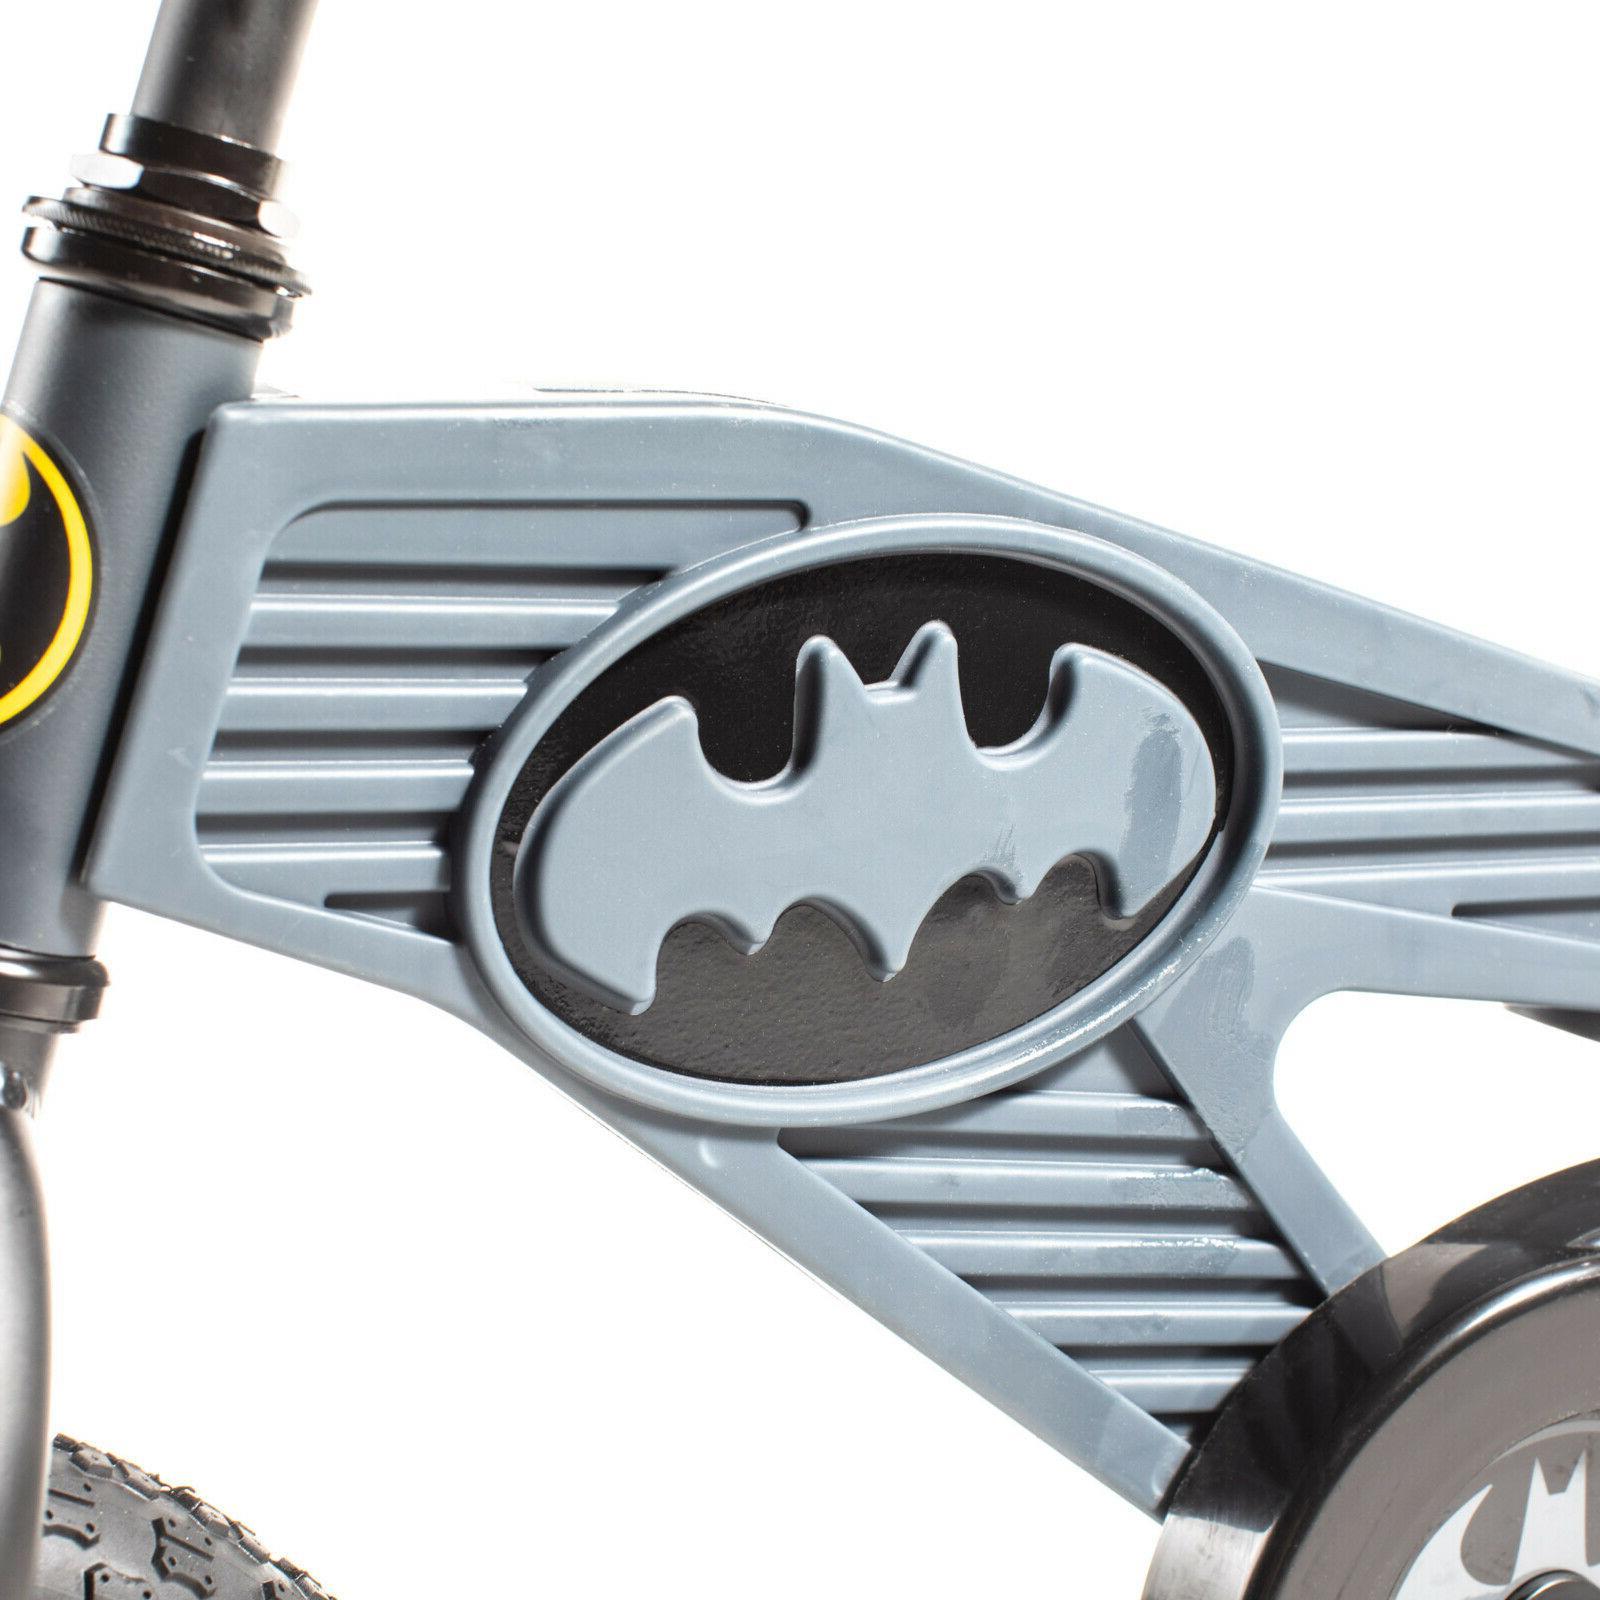 12 Inch Face Plate Theme Design Bike Wheels